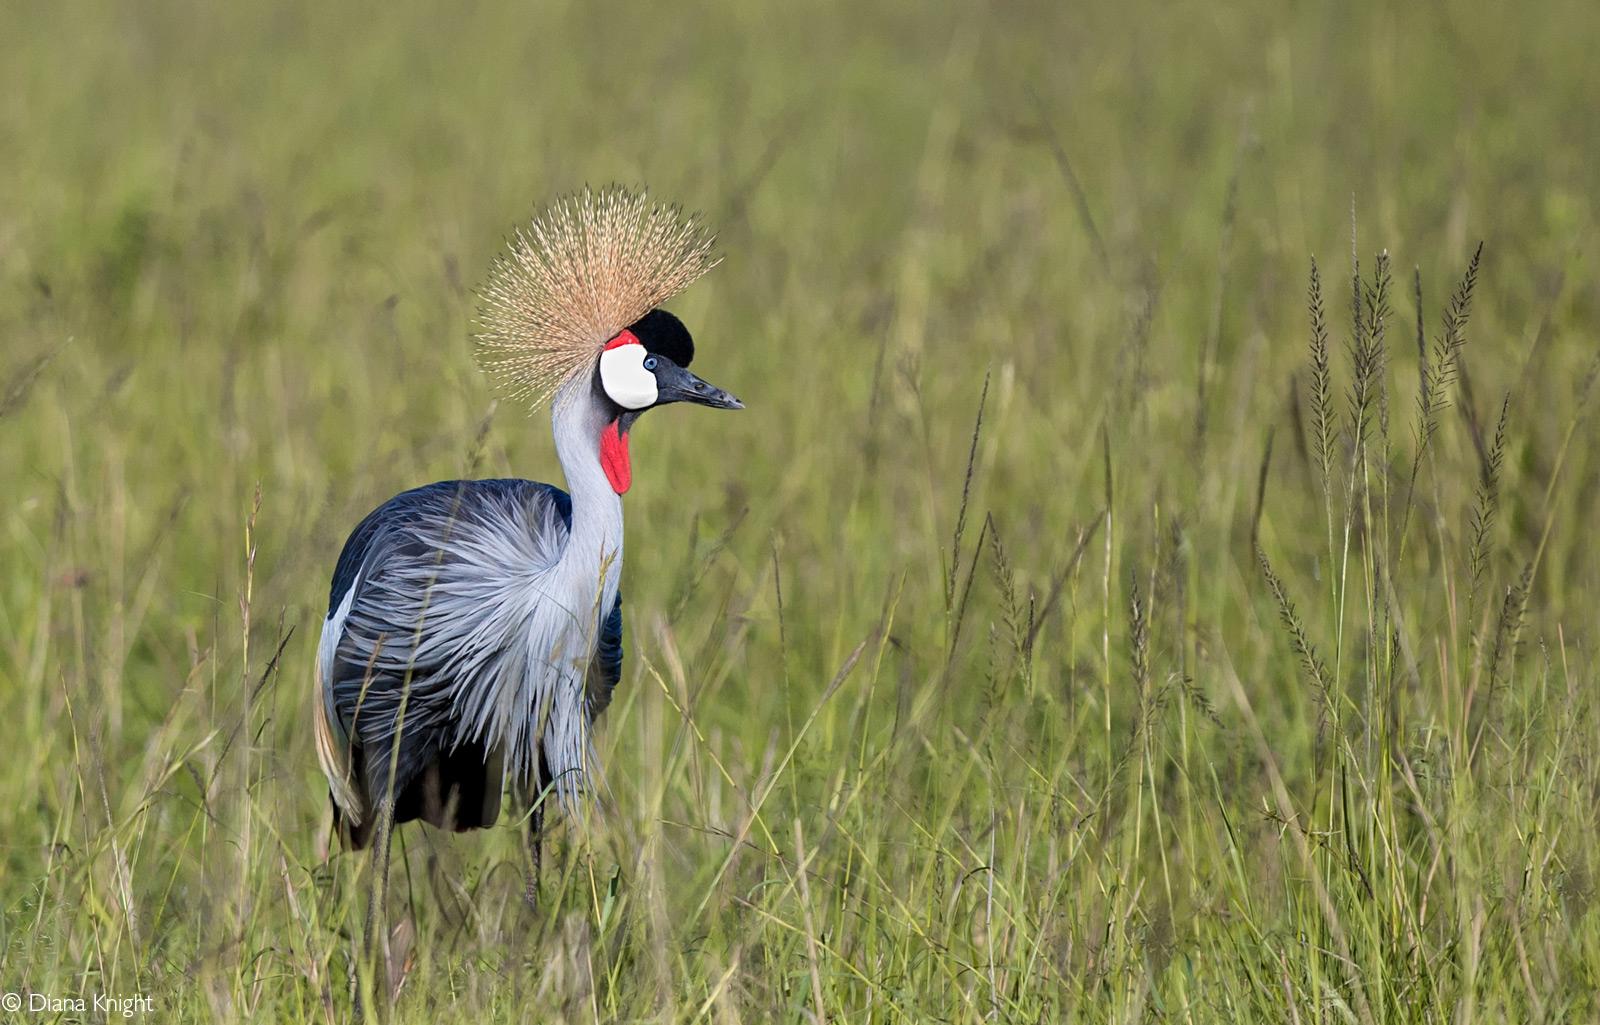 A grey crowned crane. Maasai Mara National Reserve, Kenya © Diana Knight